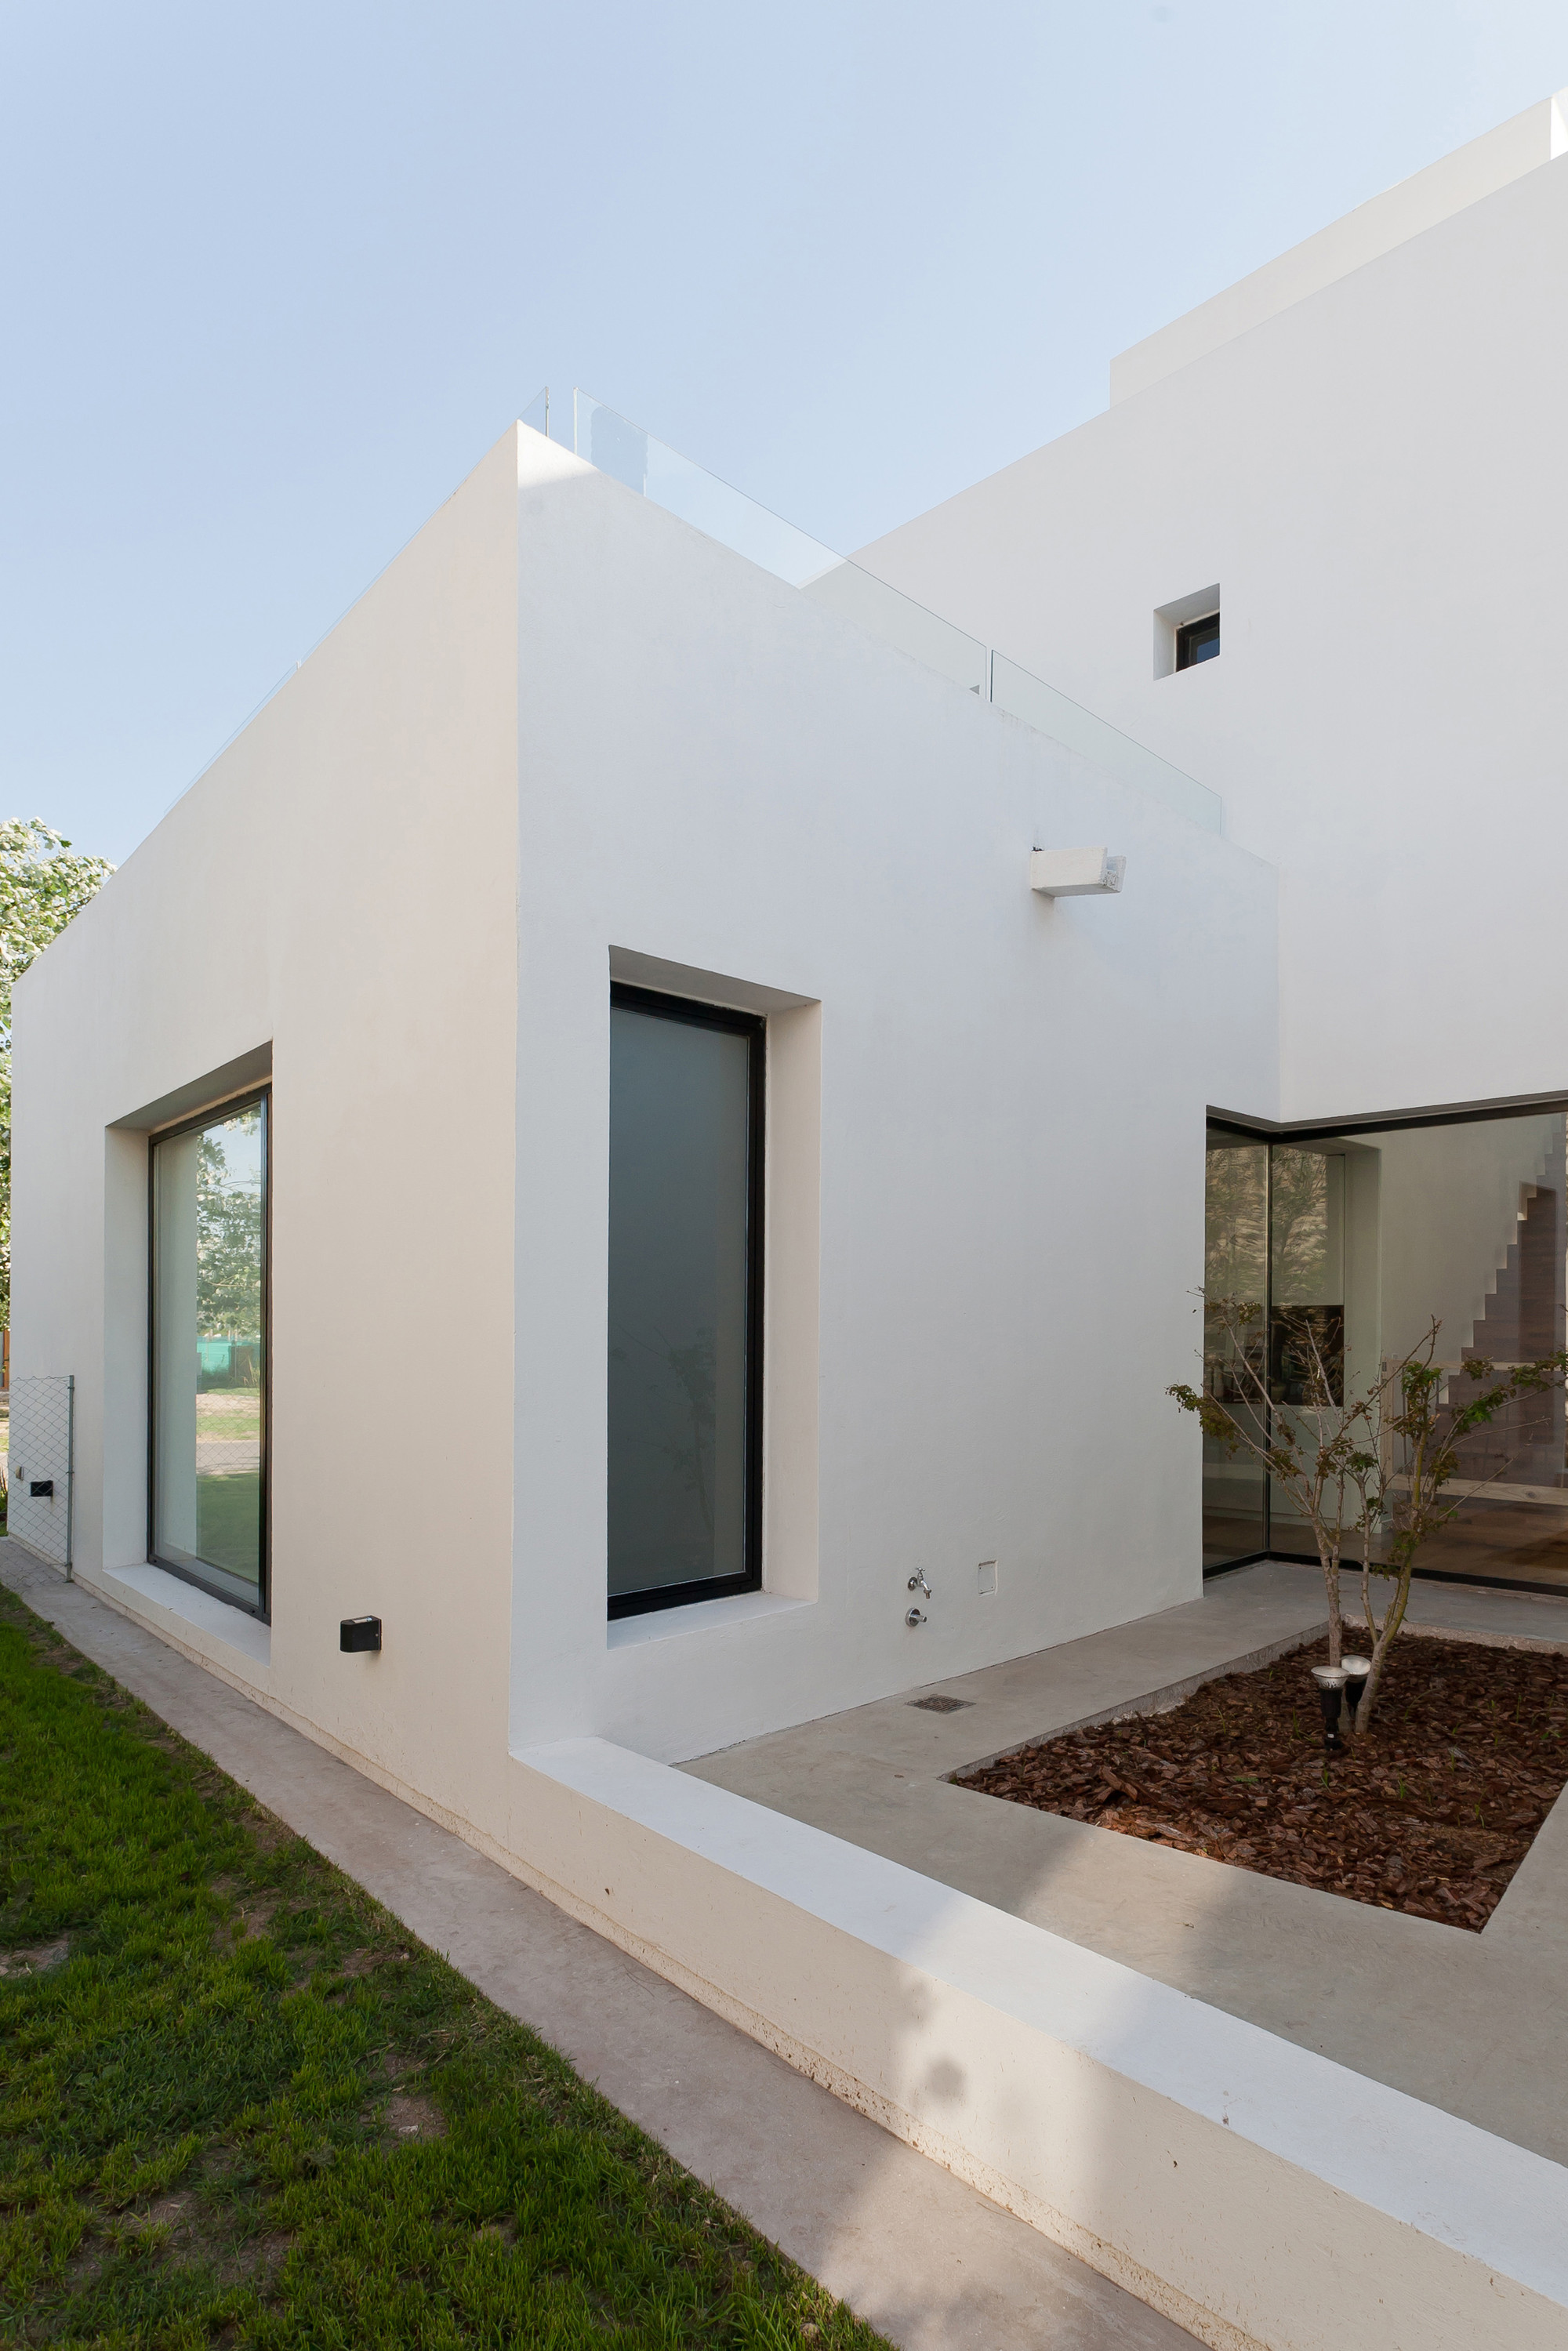 Gallery of mc house vismaracorsi arquitectos 2 - Planos de casas alargadas ...